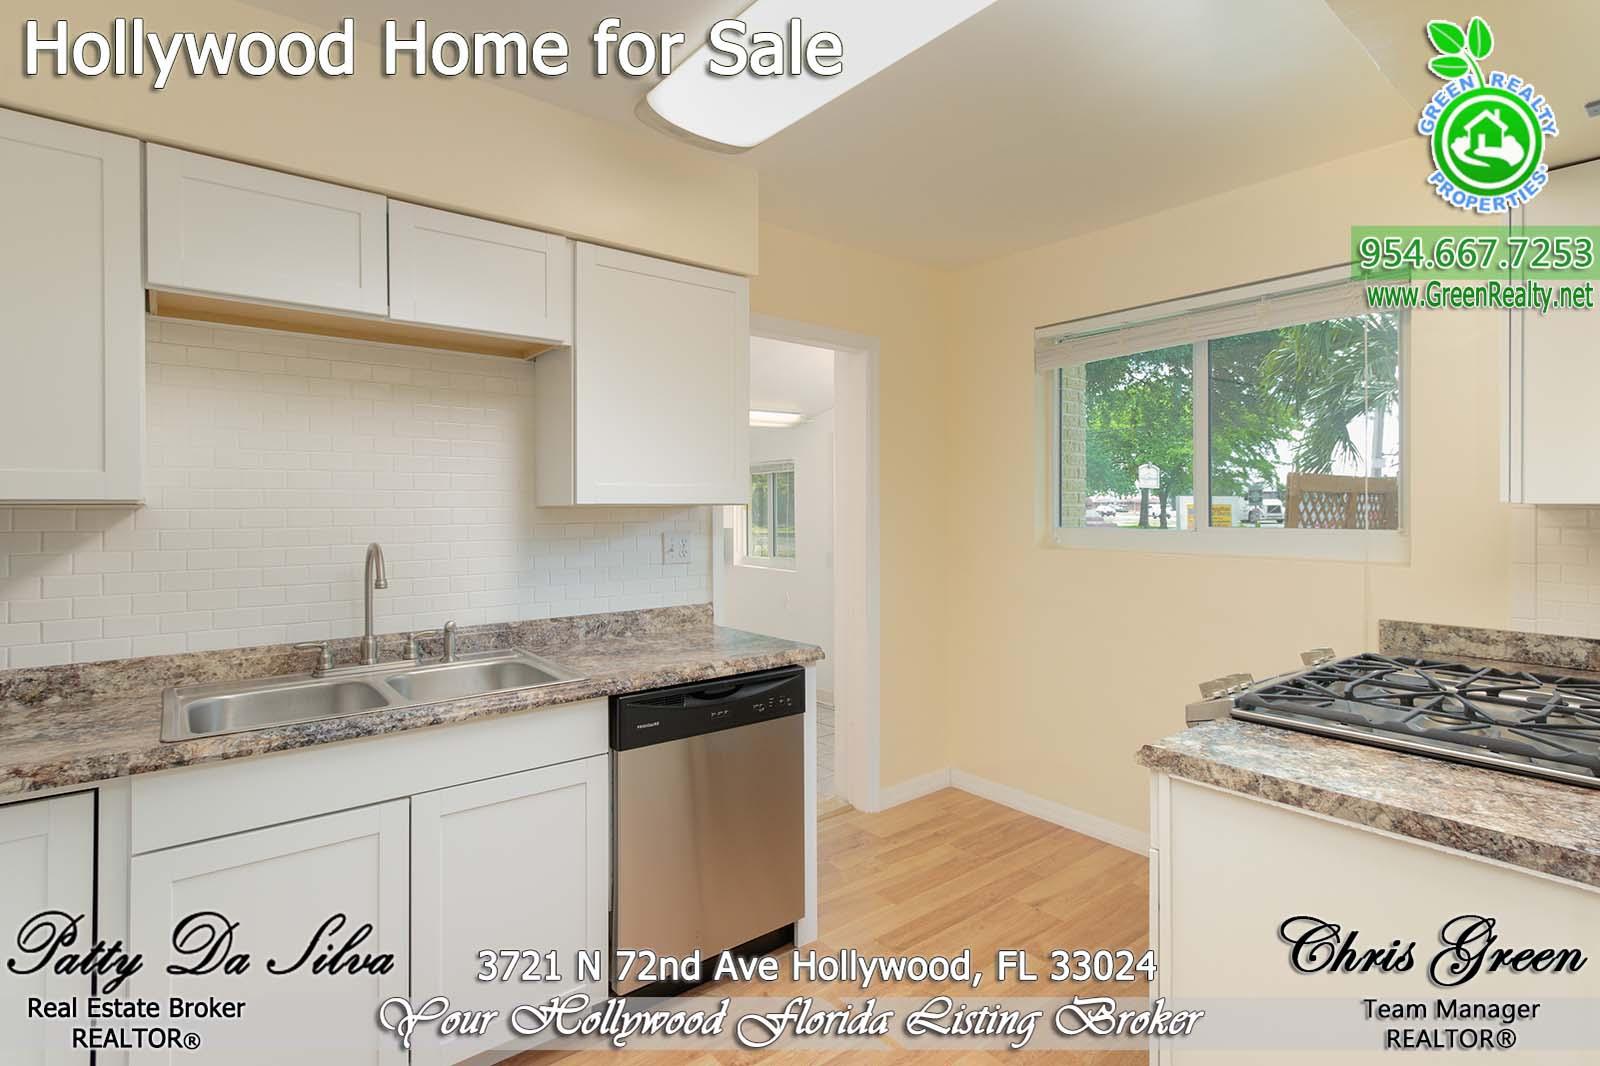 6 Hollywood Florida Real Estate Listing Patty Da Silva Green Realty properties (9)